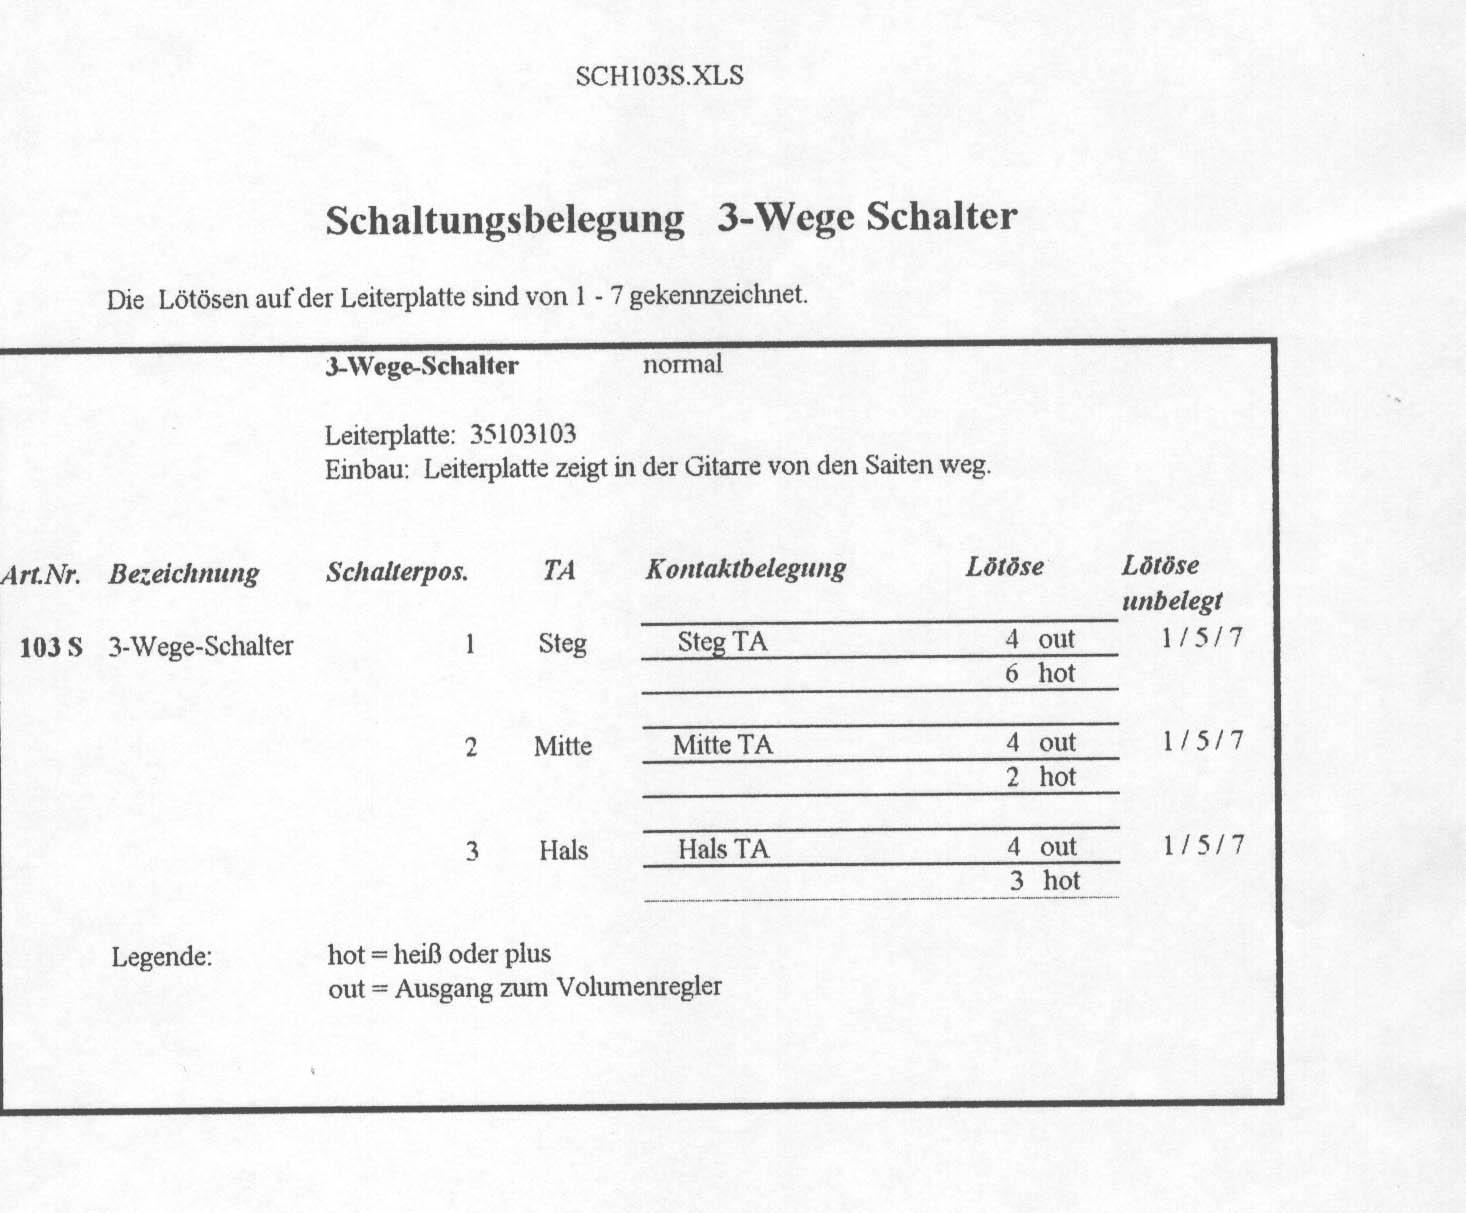 Großzügig Verkabelung 3 Wege Bilder - Schaltplan Serie Circuit ...